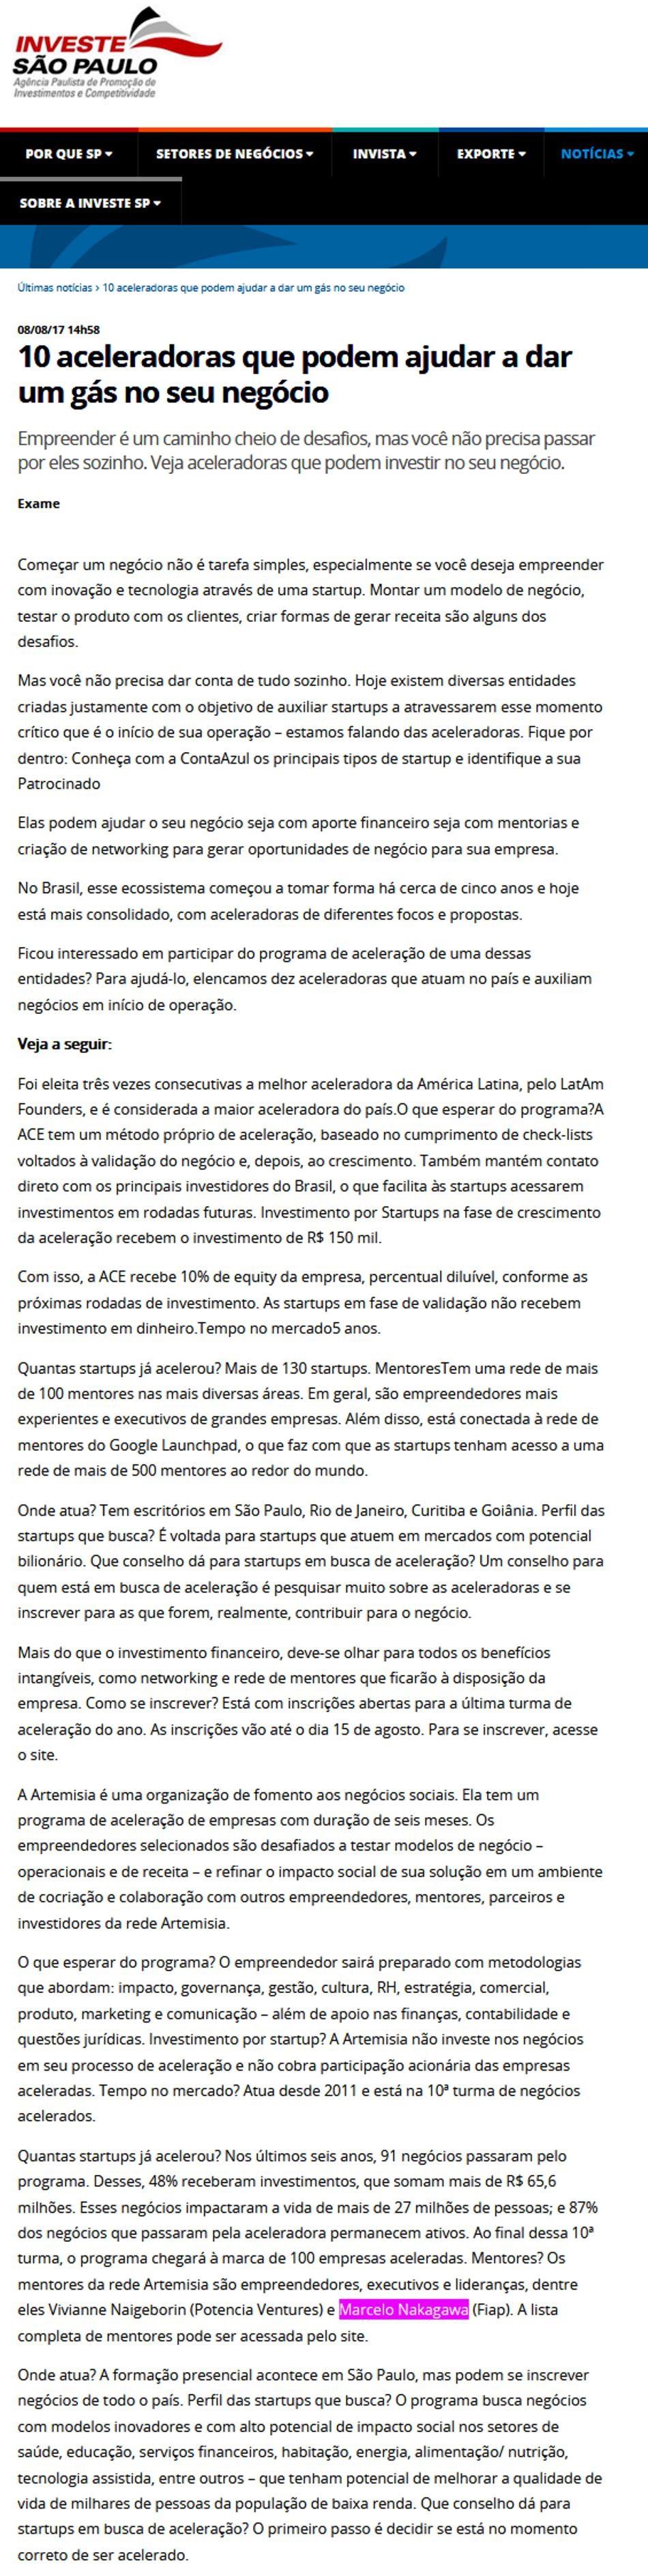 0808 - Site Investe São Paulo